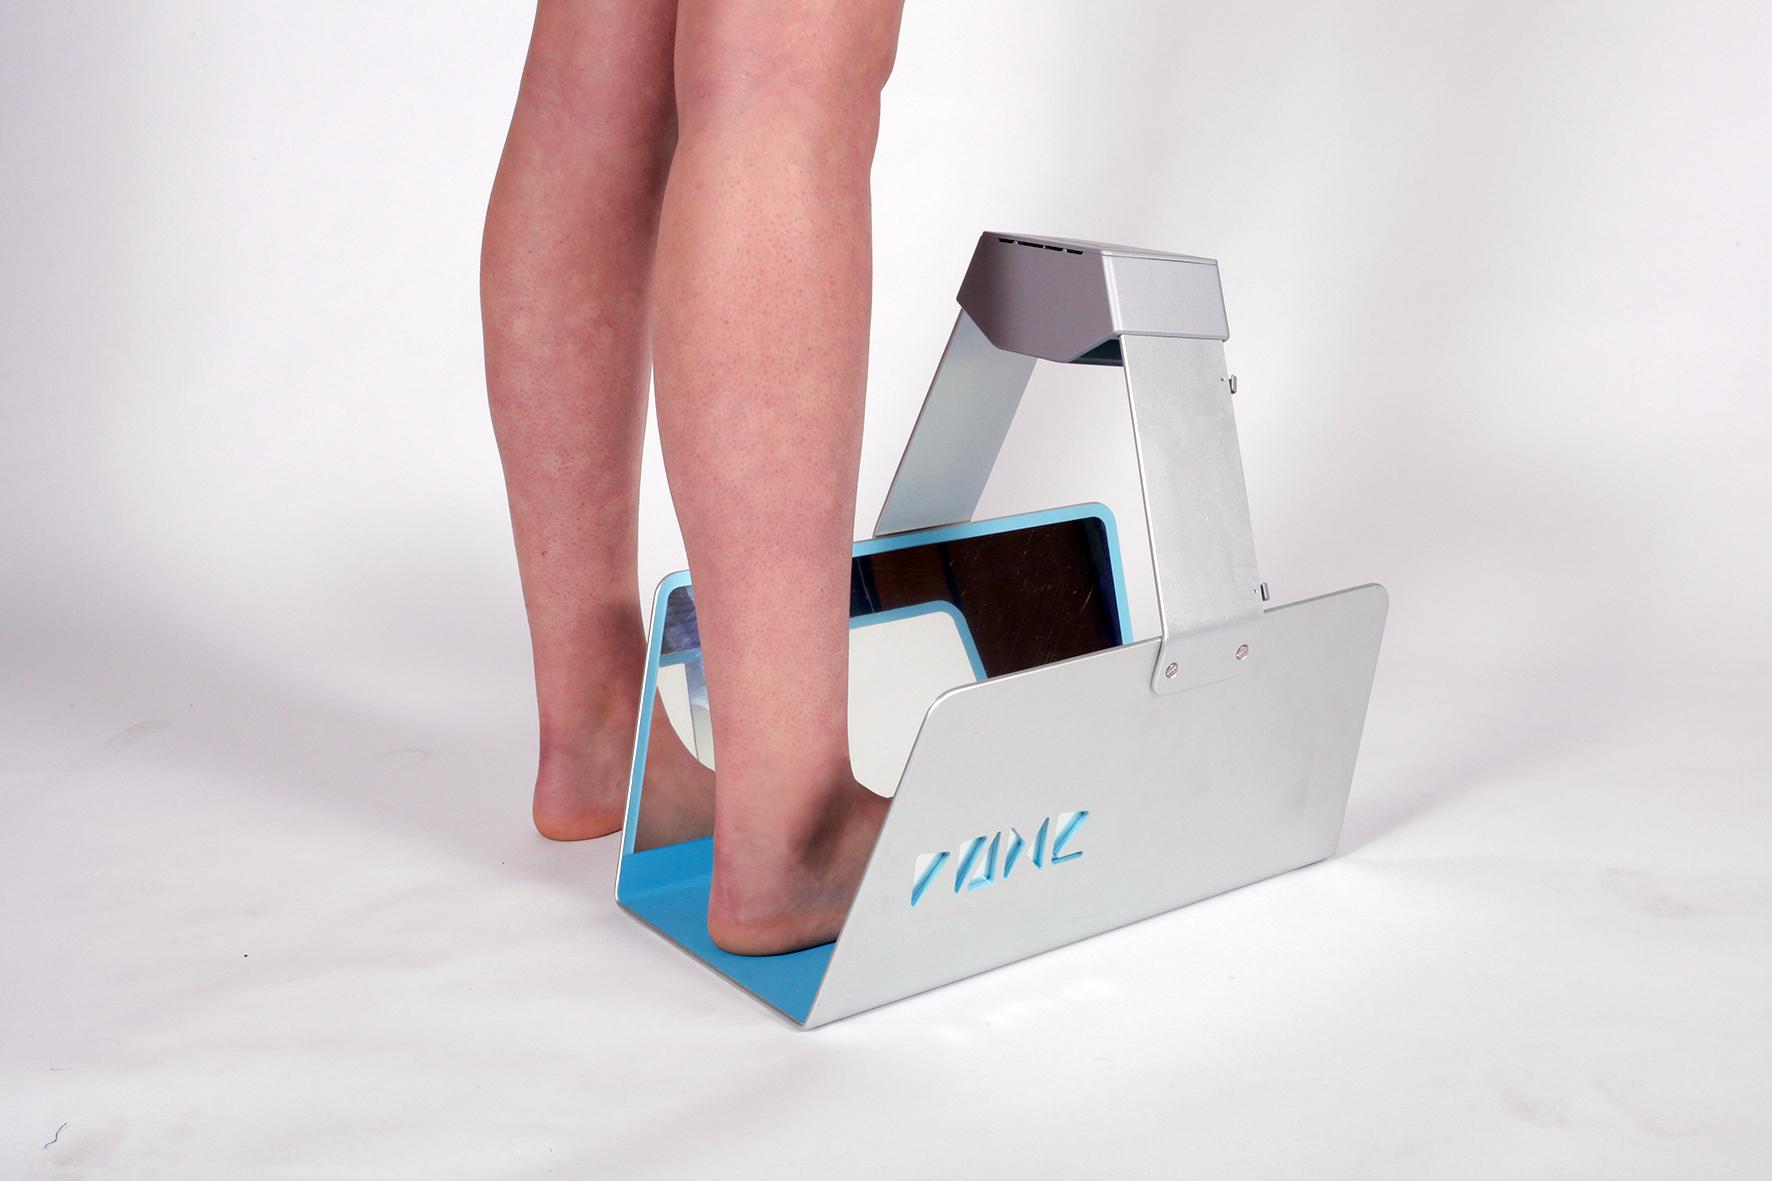 instituto de biomec nica develops mobile app to 3d scan human body article thu 29 oct 2015. Black Bedroom Furniture Sets. Home Design Ideas